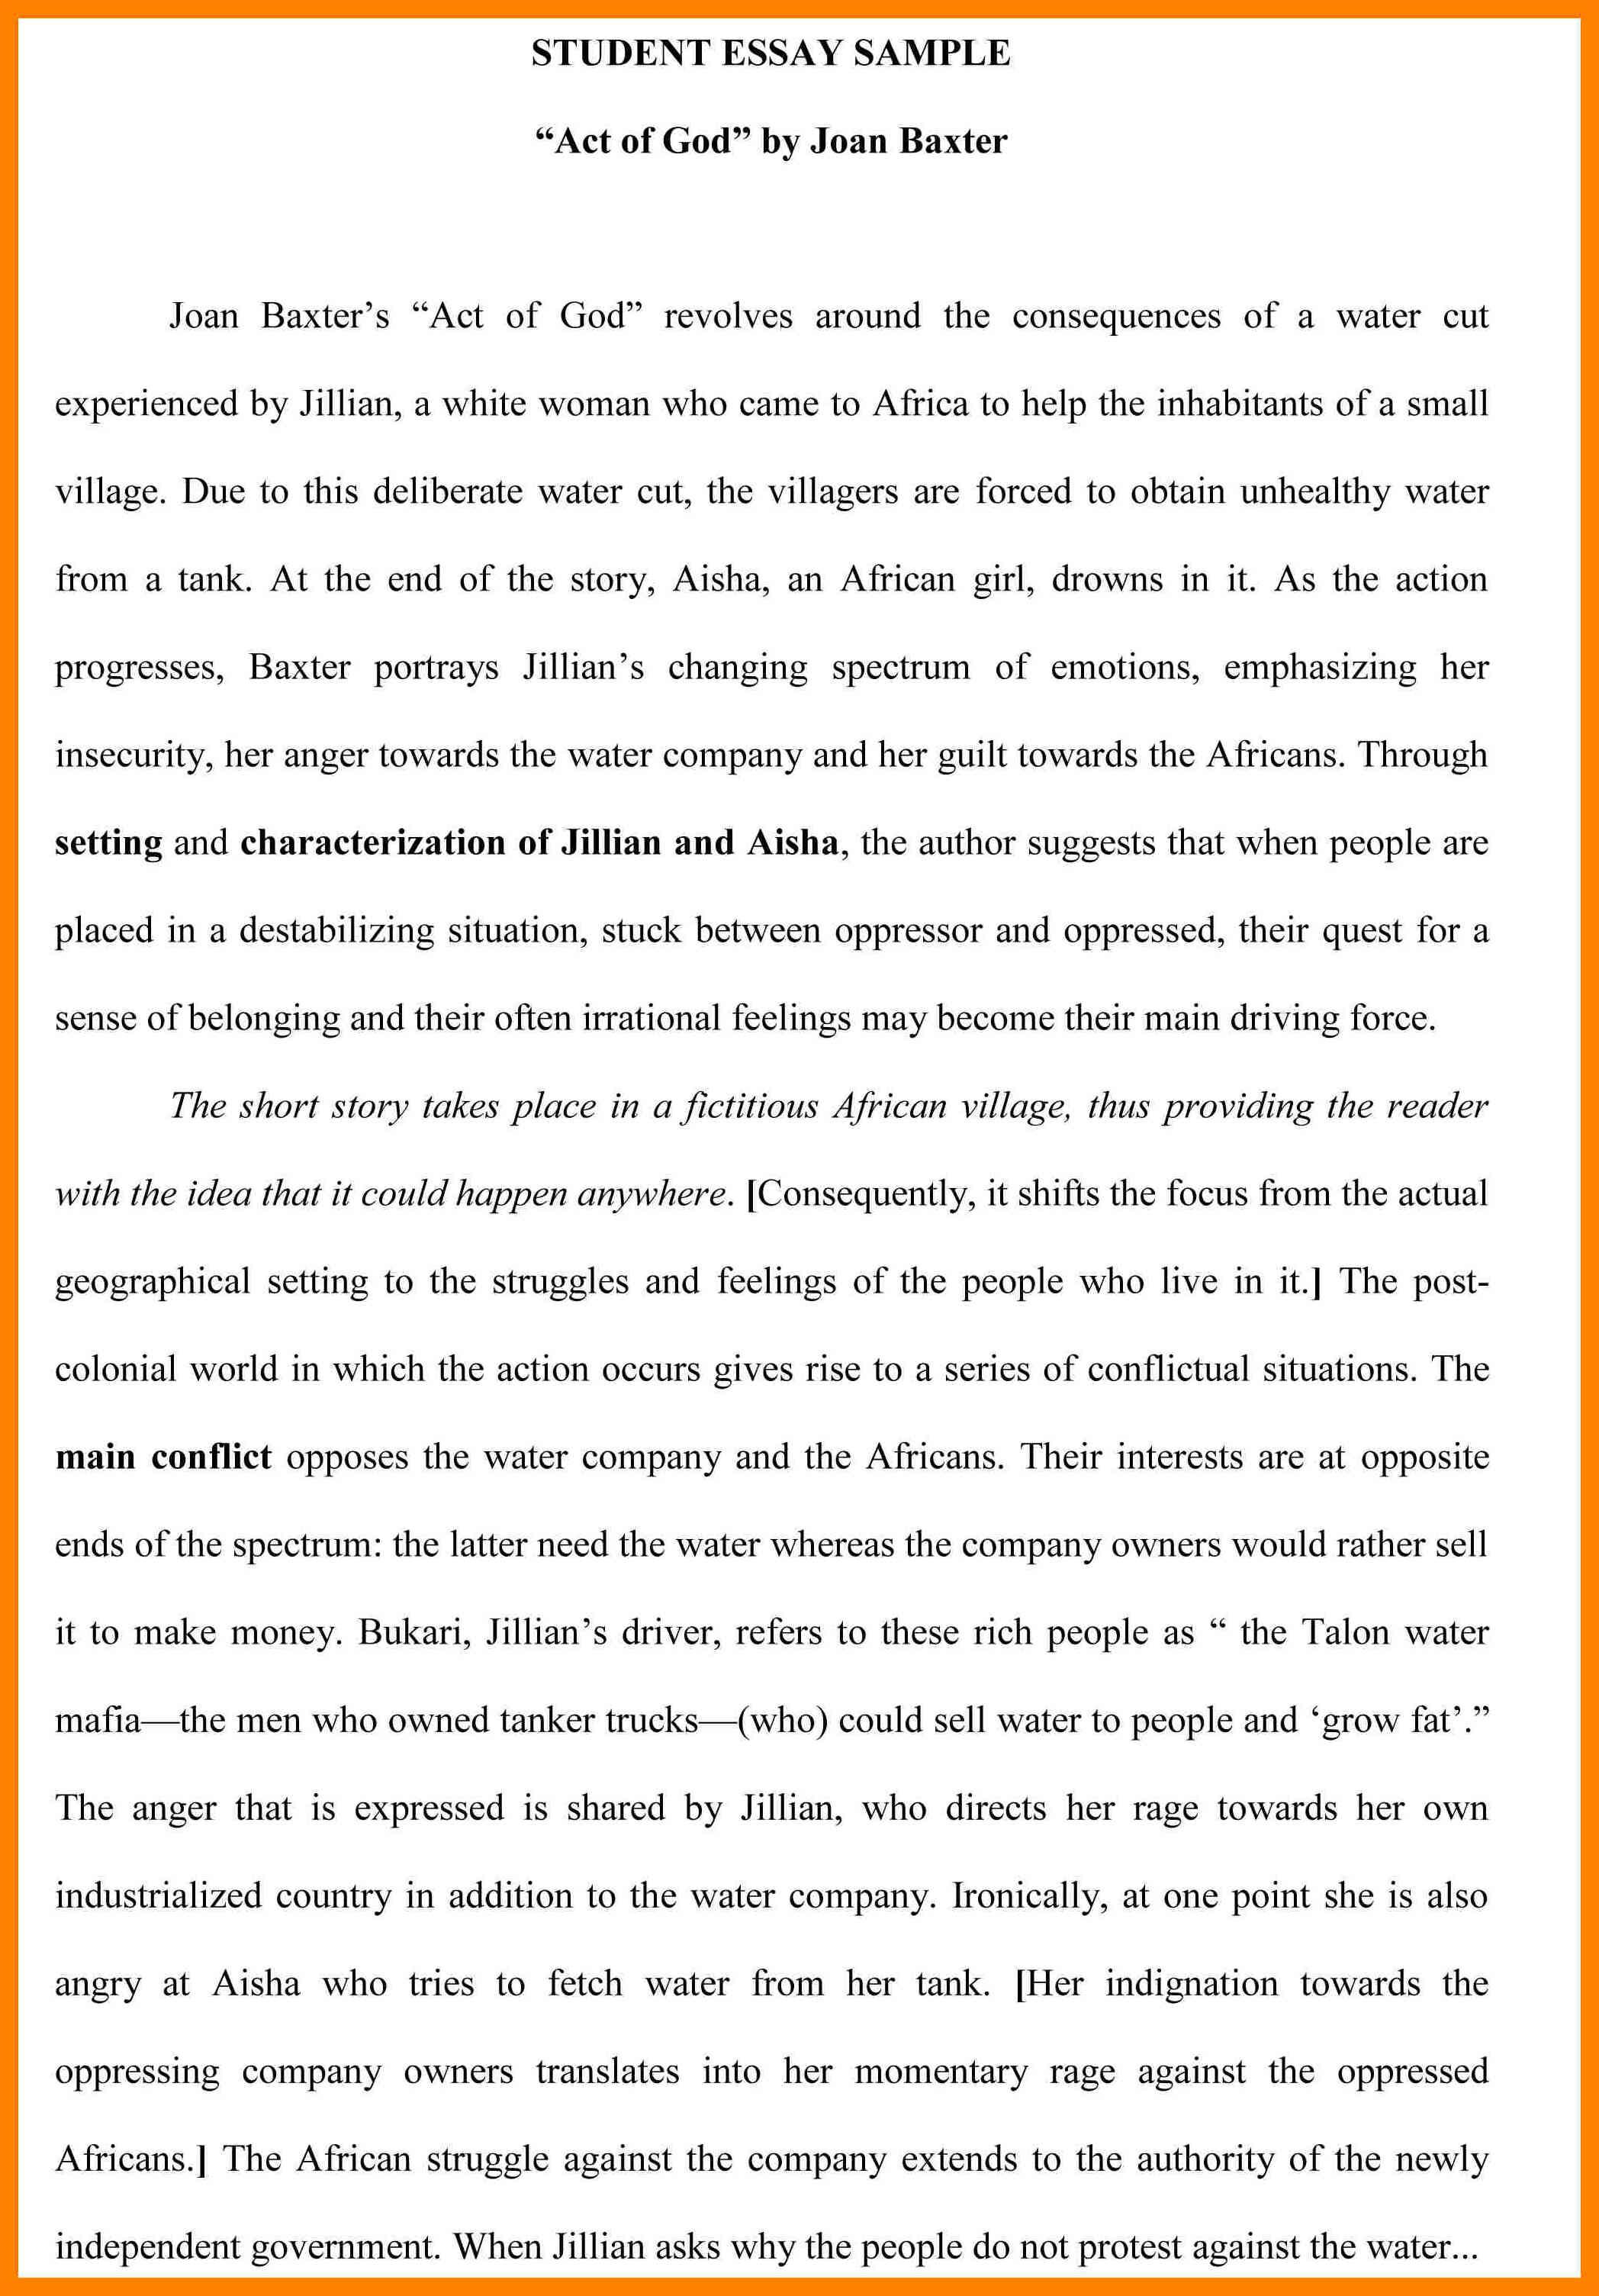 001 Sample Math Test Act Elmifermetures Com Ideas Collection Essay Awesome Of Livesto Essays Pdf New Topics Wonderful Full